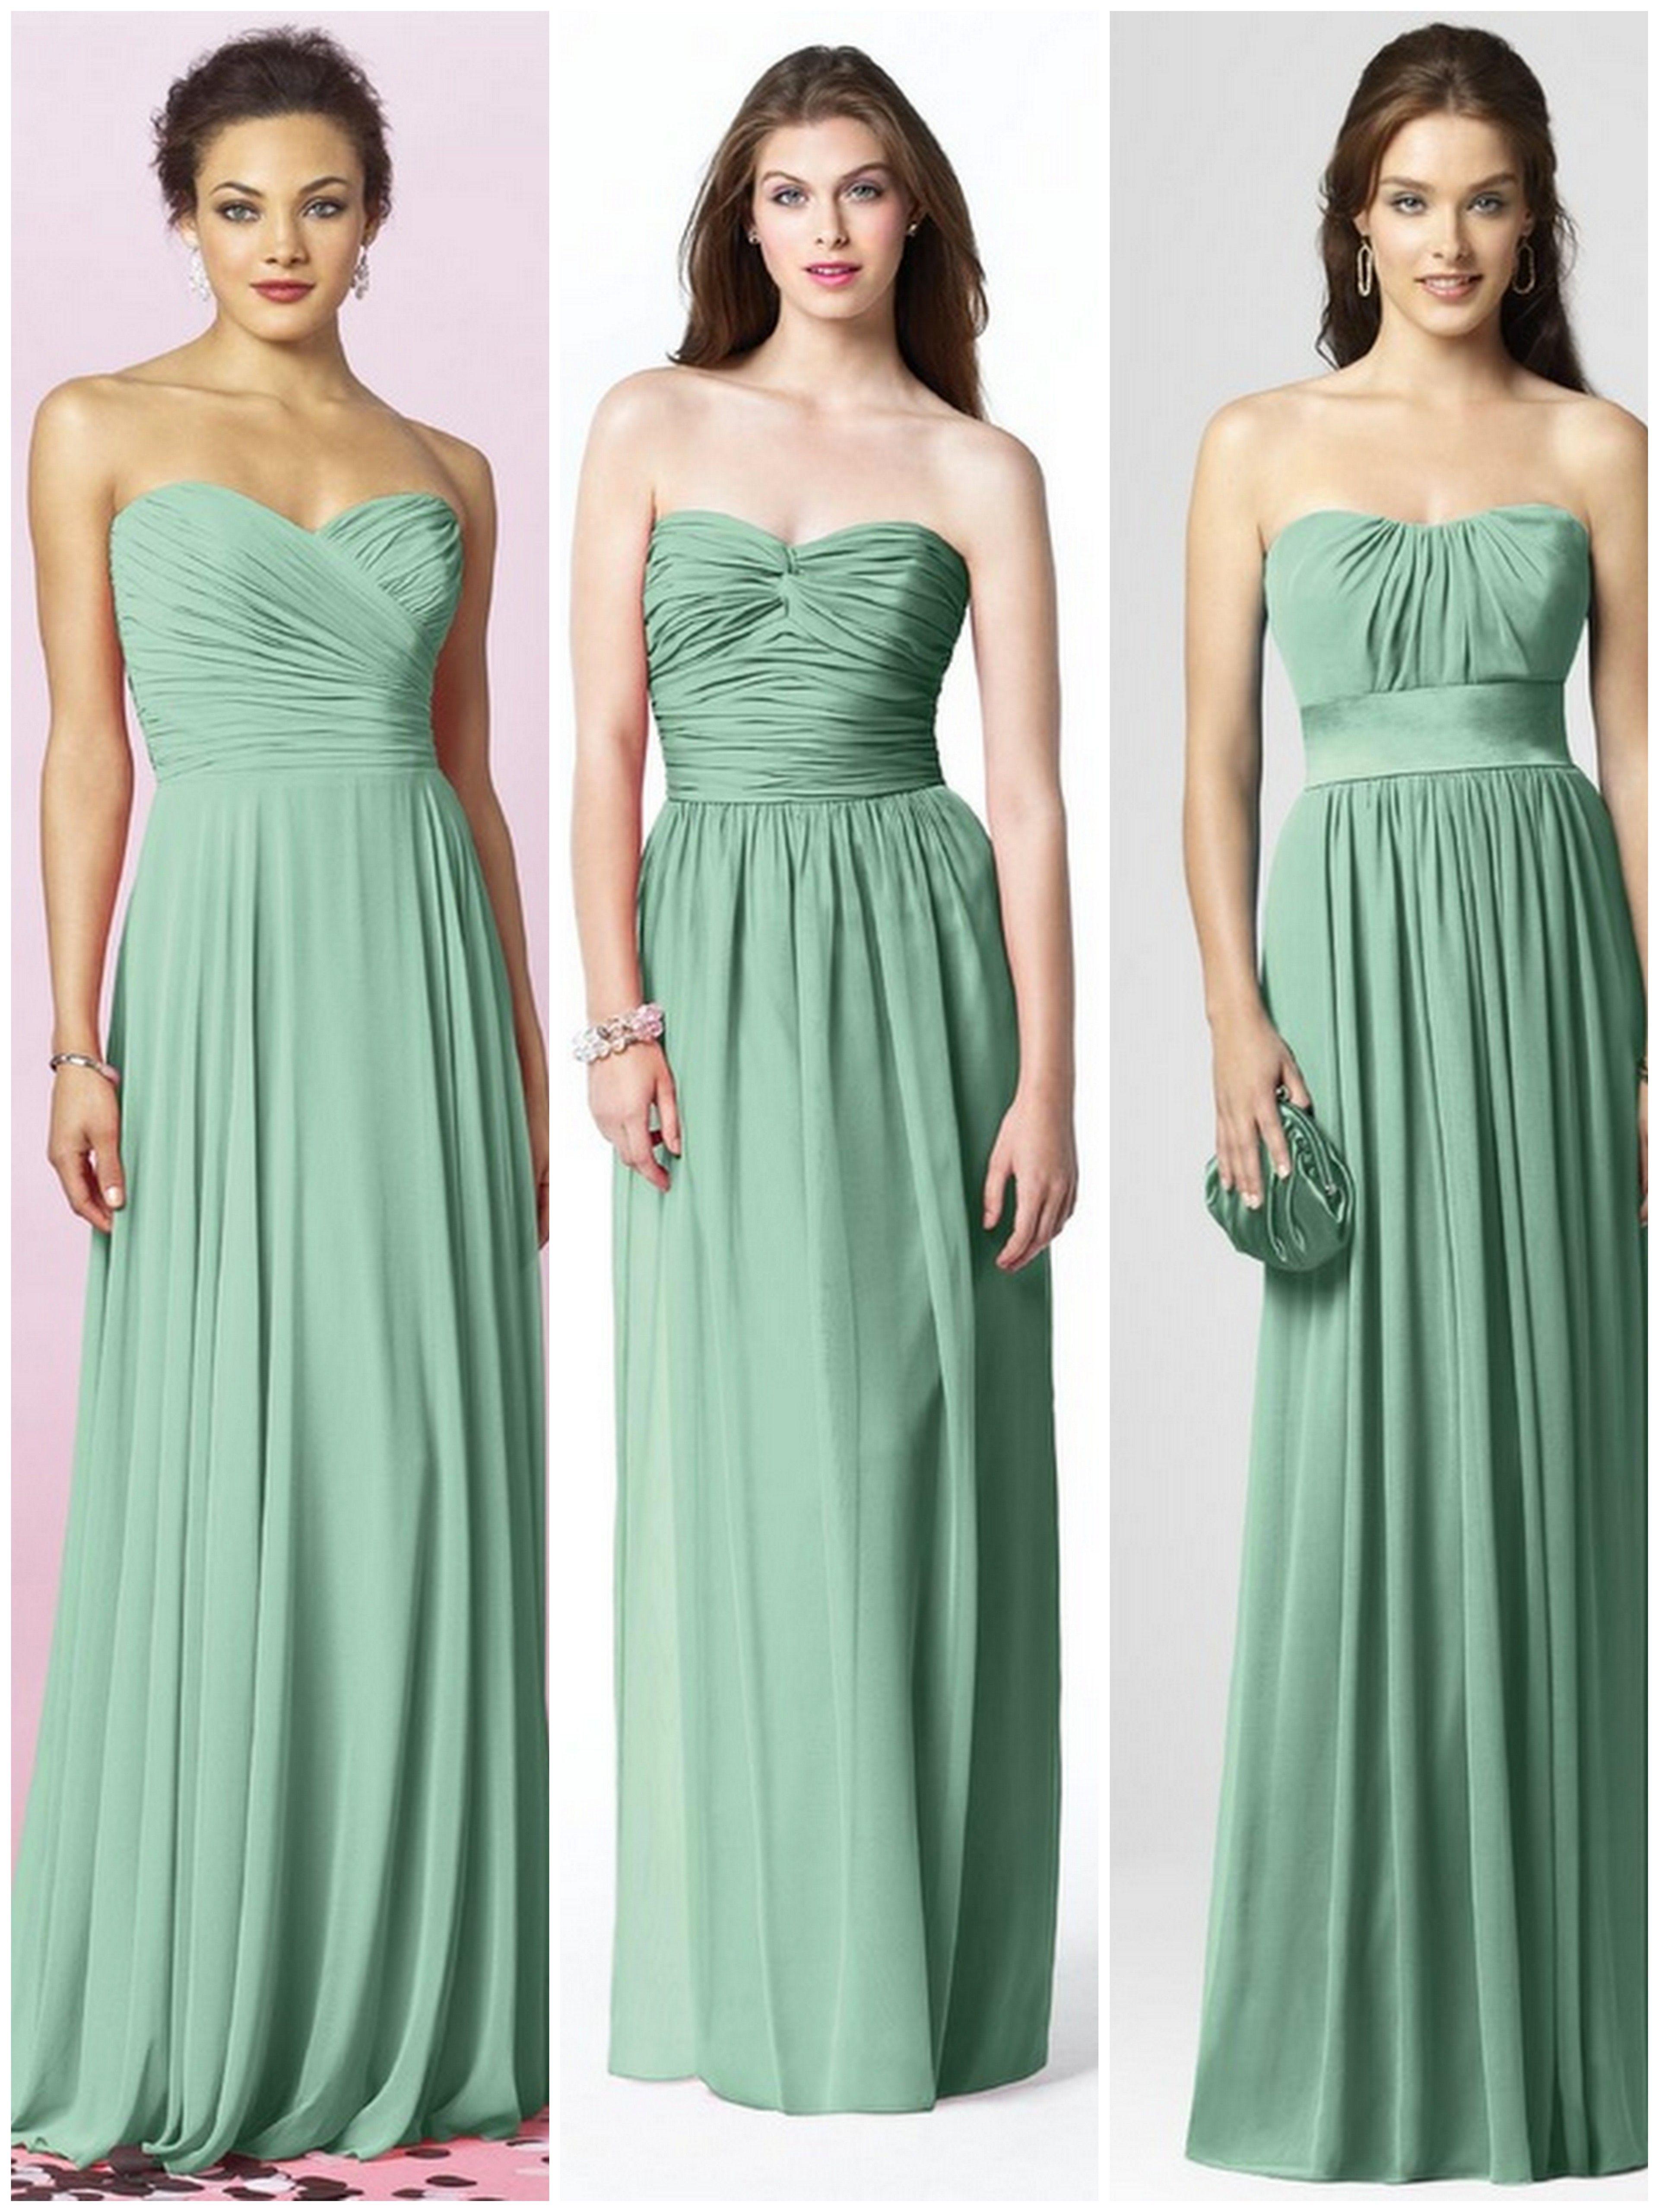 1000  images about Top 200 Blue bridesmaid dresses on Pinterest ...